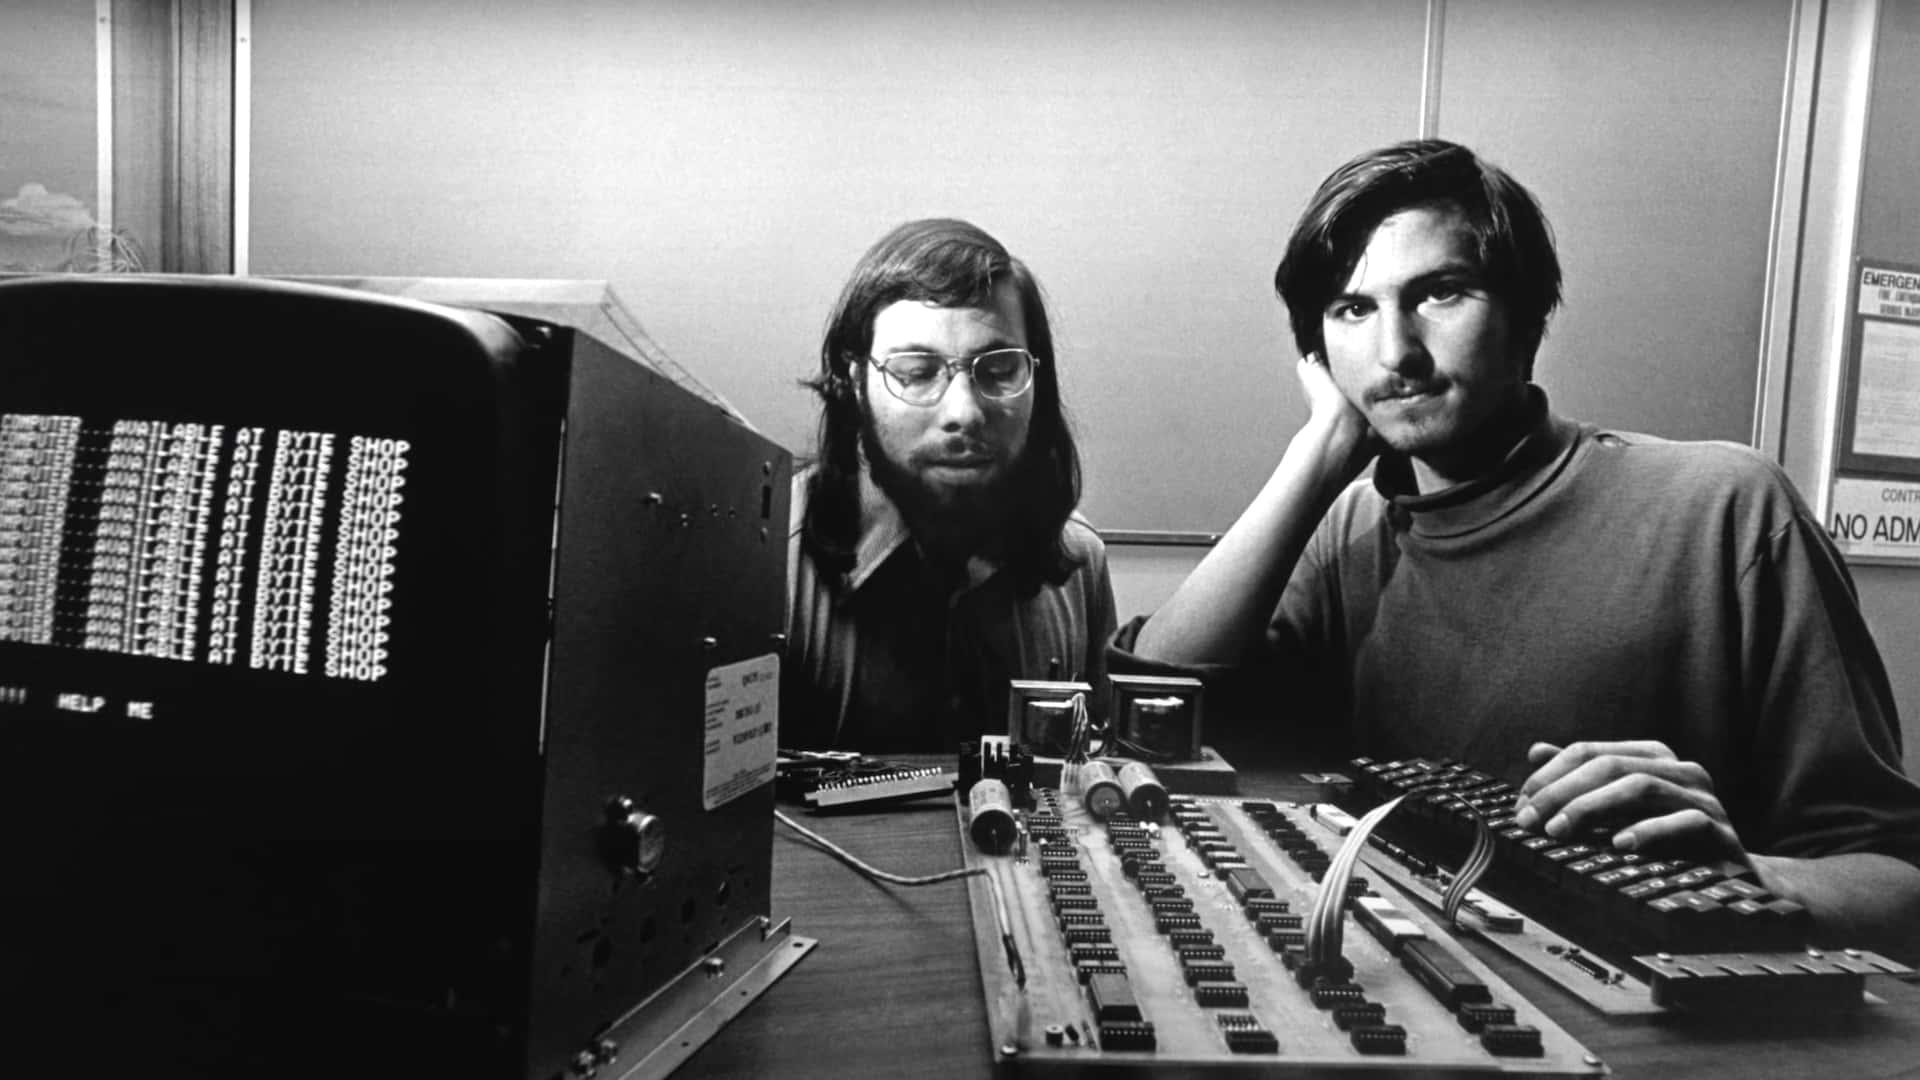 Steve Jobs Innovation